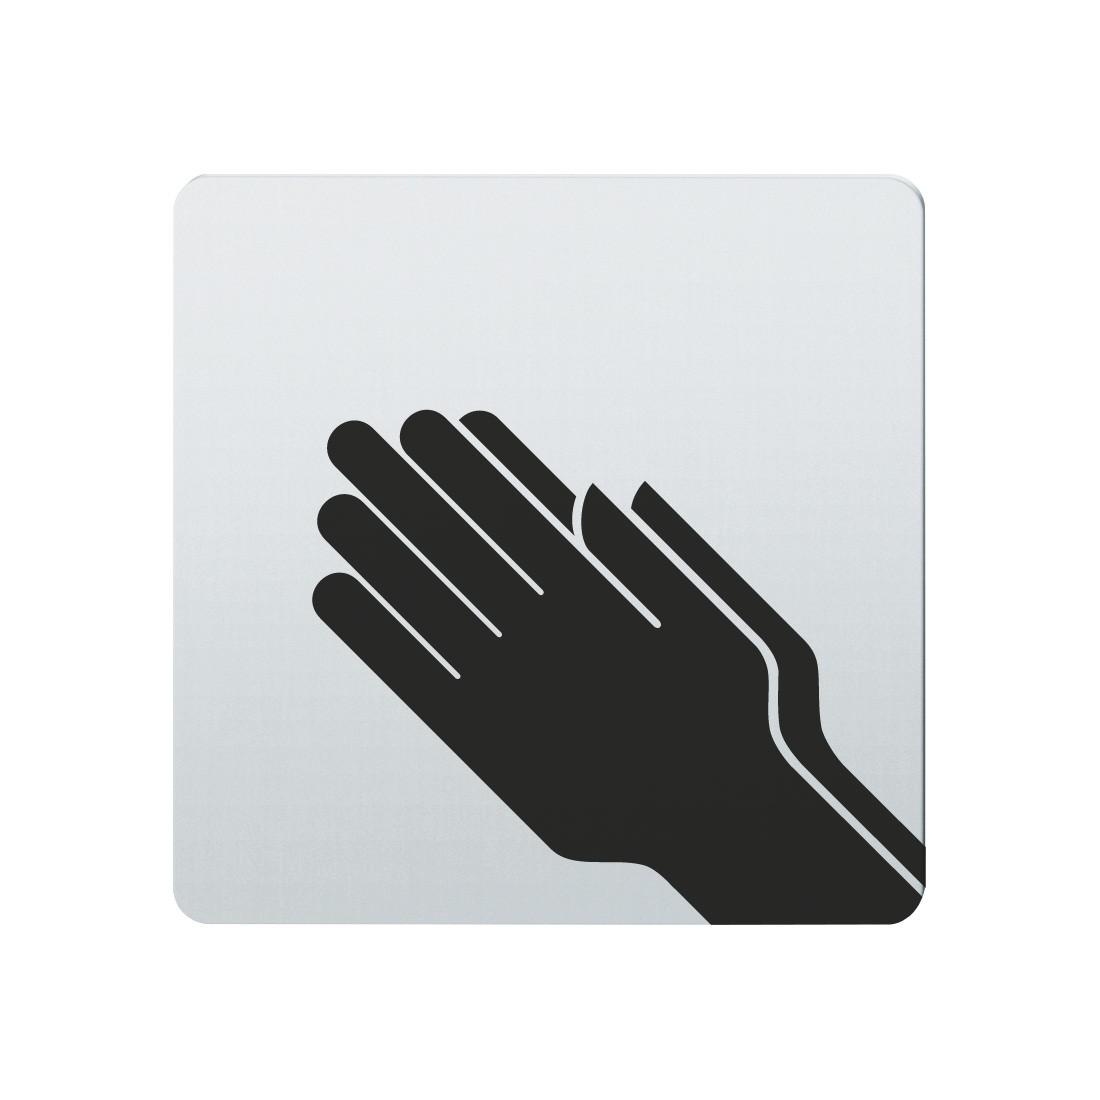 FSB Hinweiszeichen Andachtsraum Lasergraviert Edelstahl fein matt (0 36 4059 00154 6204)